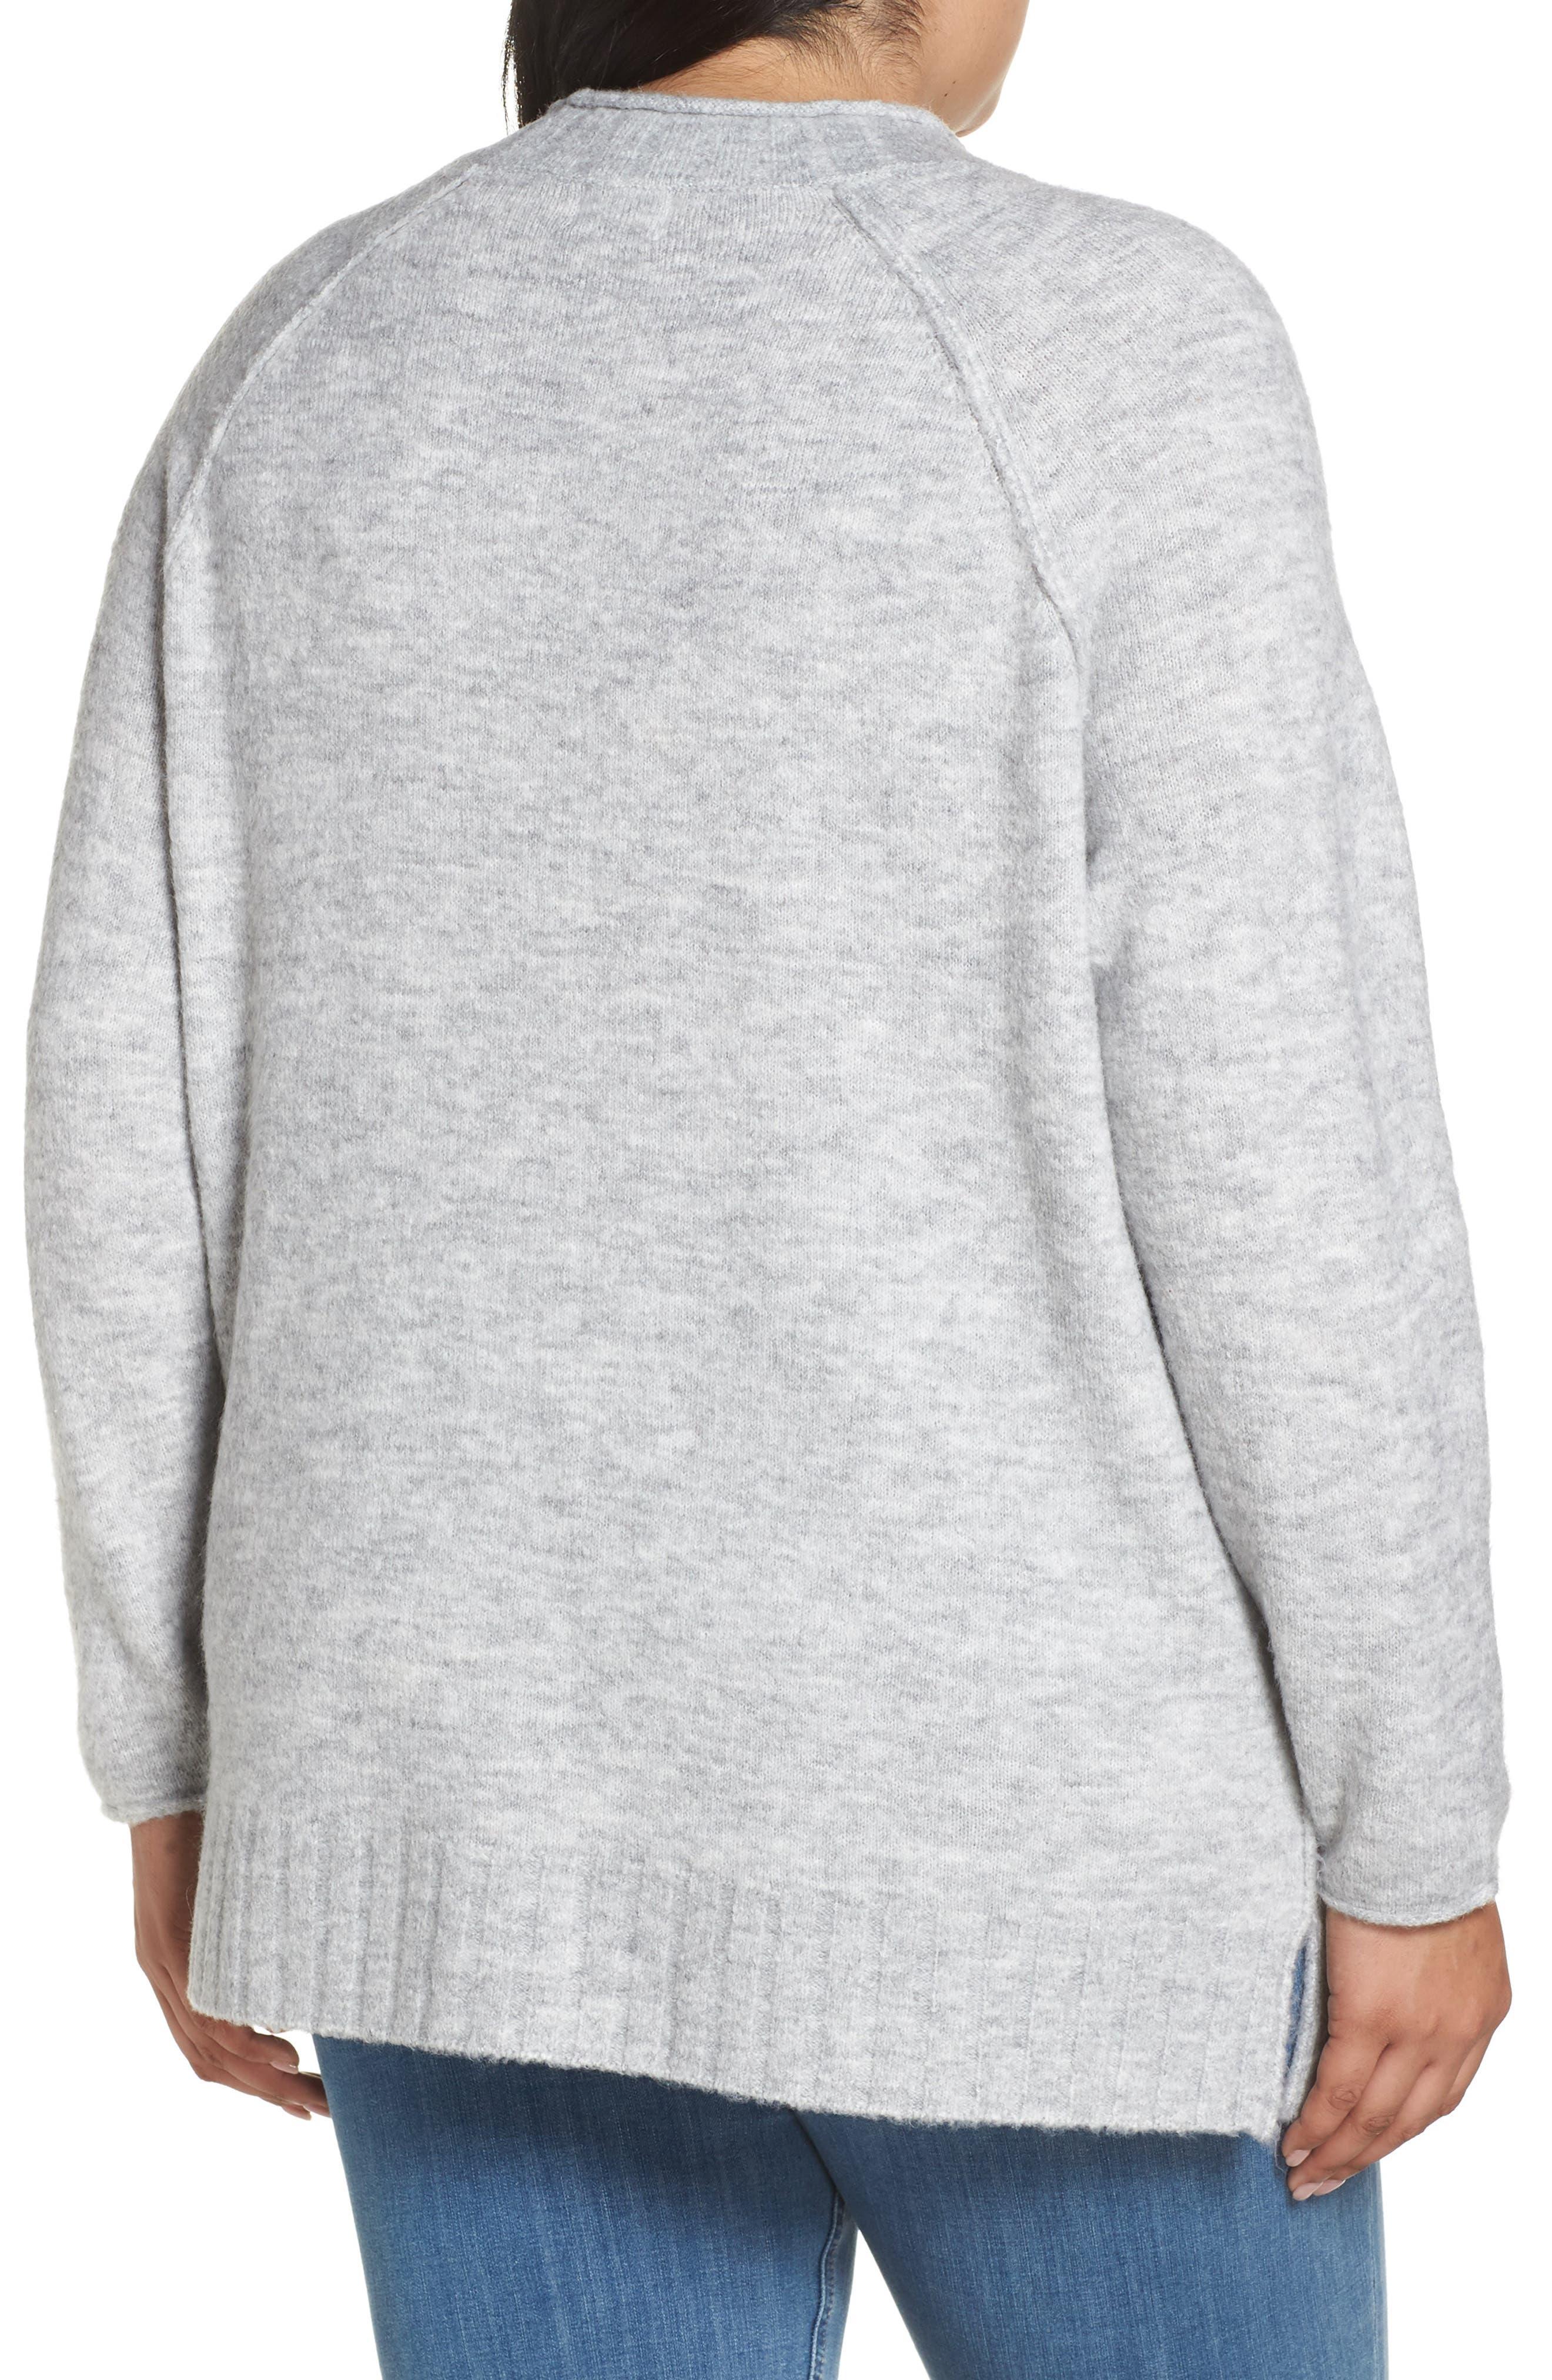 Cozy Crewneck Sweater,                             Alternate thumbnail 2, color,                             GREY HEATHER